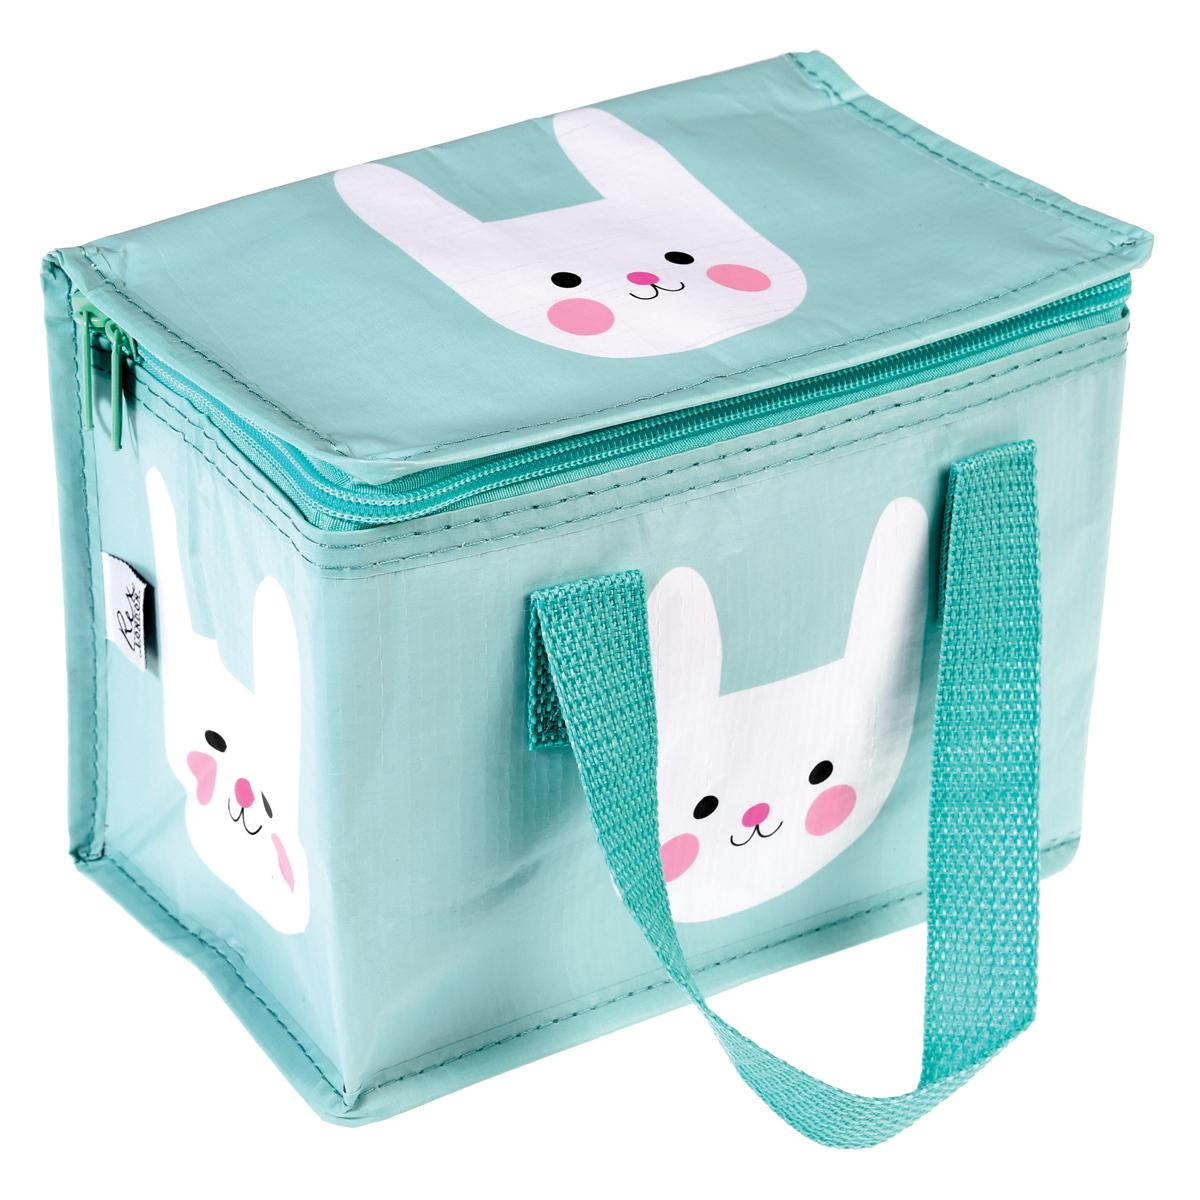 Sac isotherme Lunch Bag - Bonnie le Lapin Lunch Bag - Bonnie le Lapin